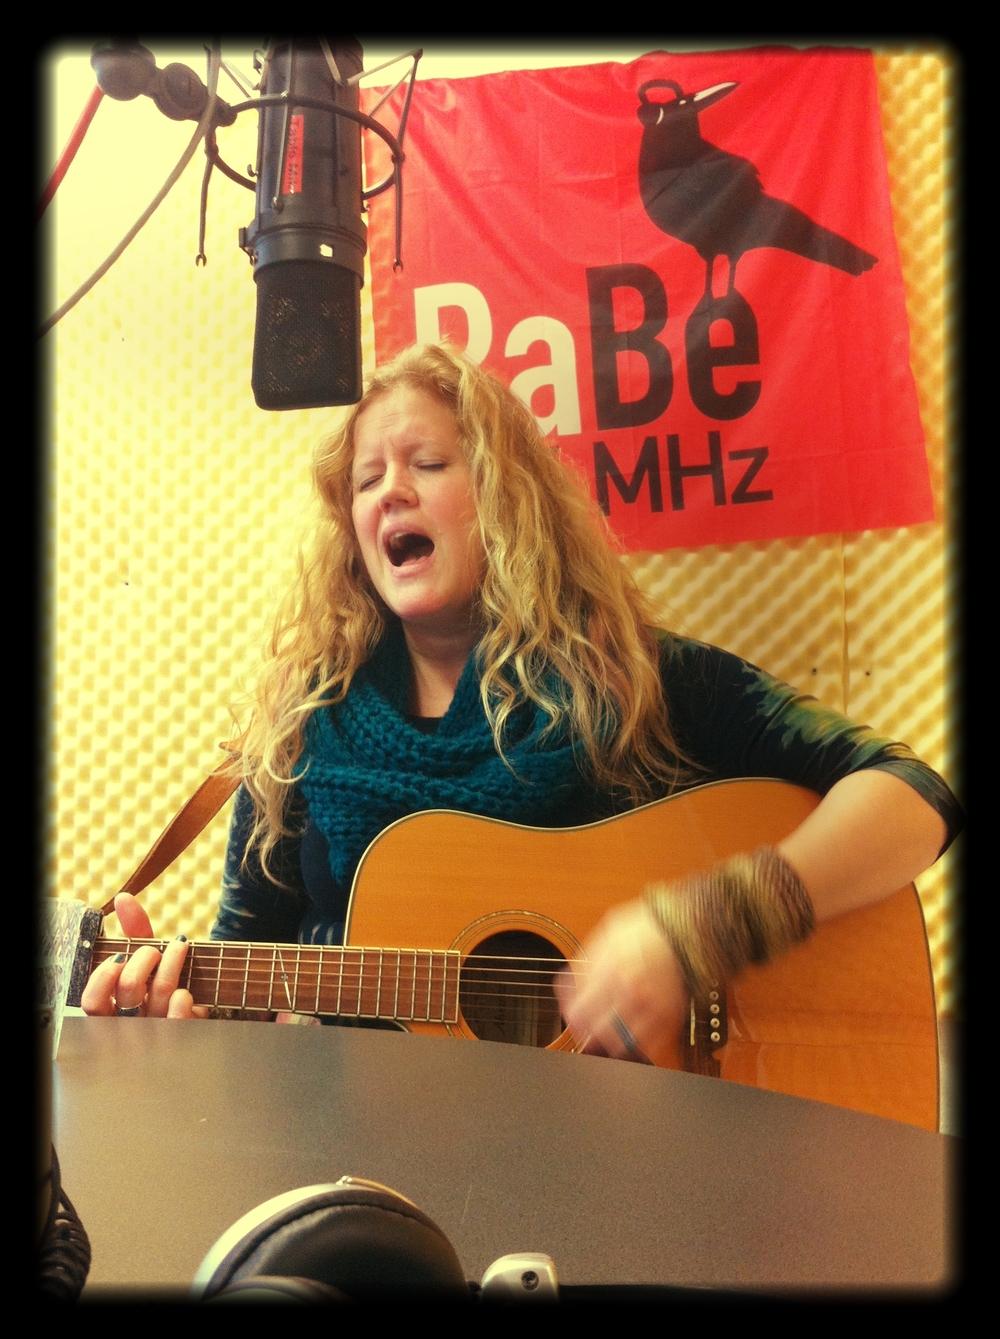 Me_singing_live_on_RADIO_RABE_in_Bern